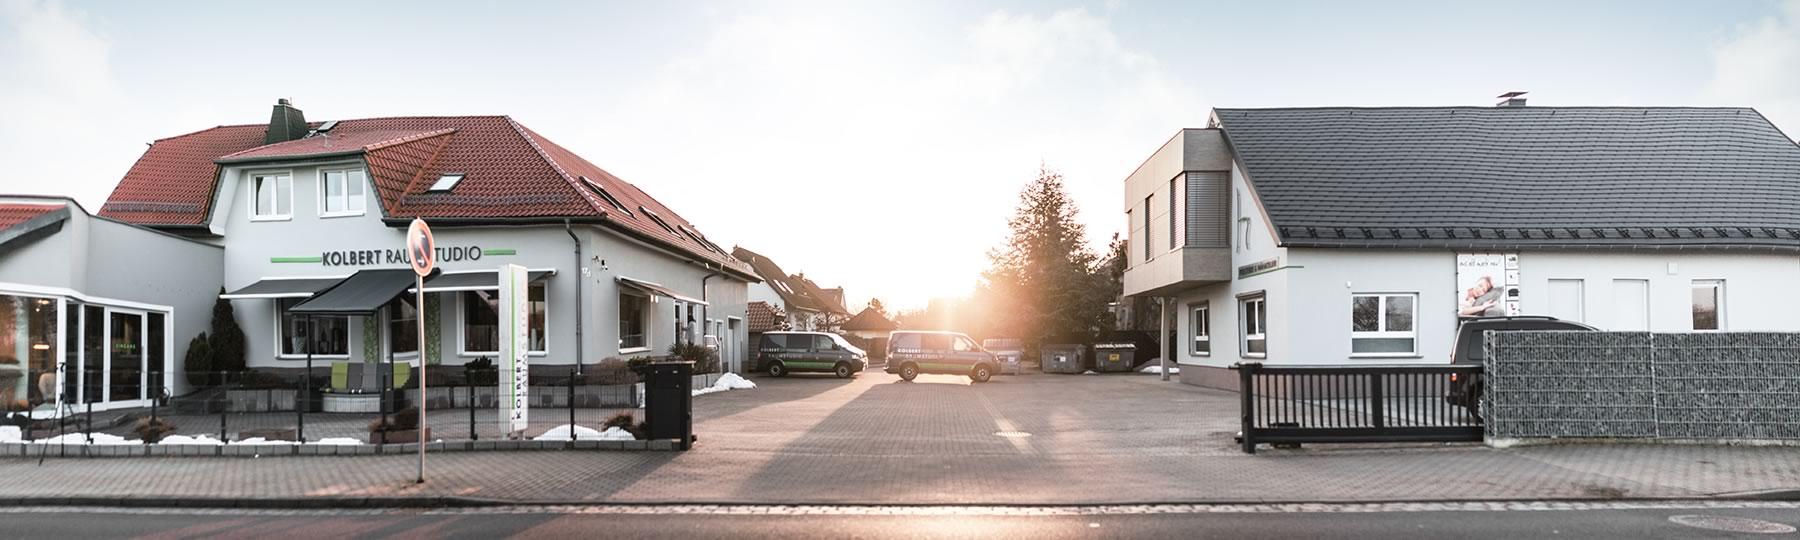 Kolbert Raumstudio Panorama